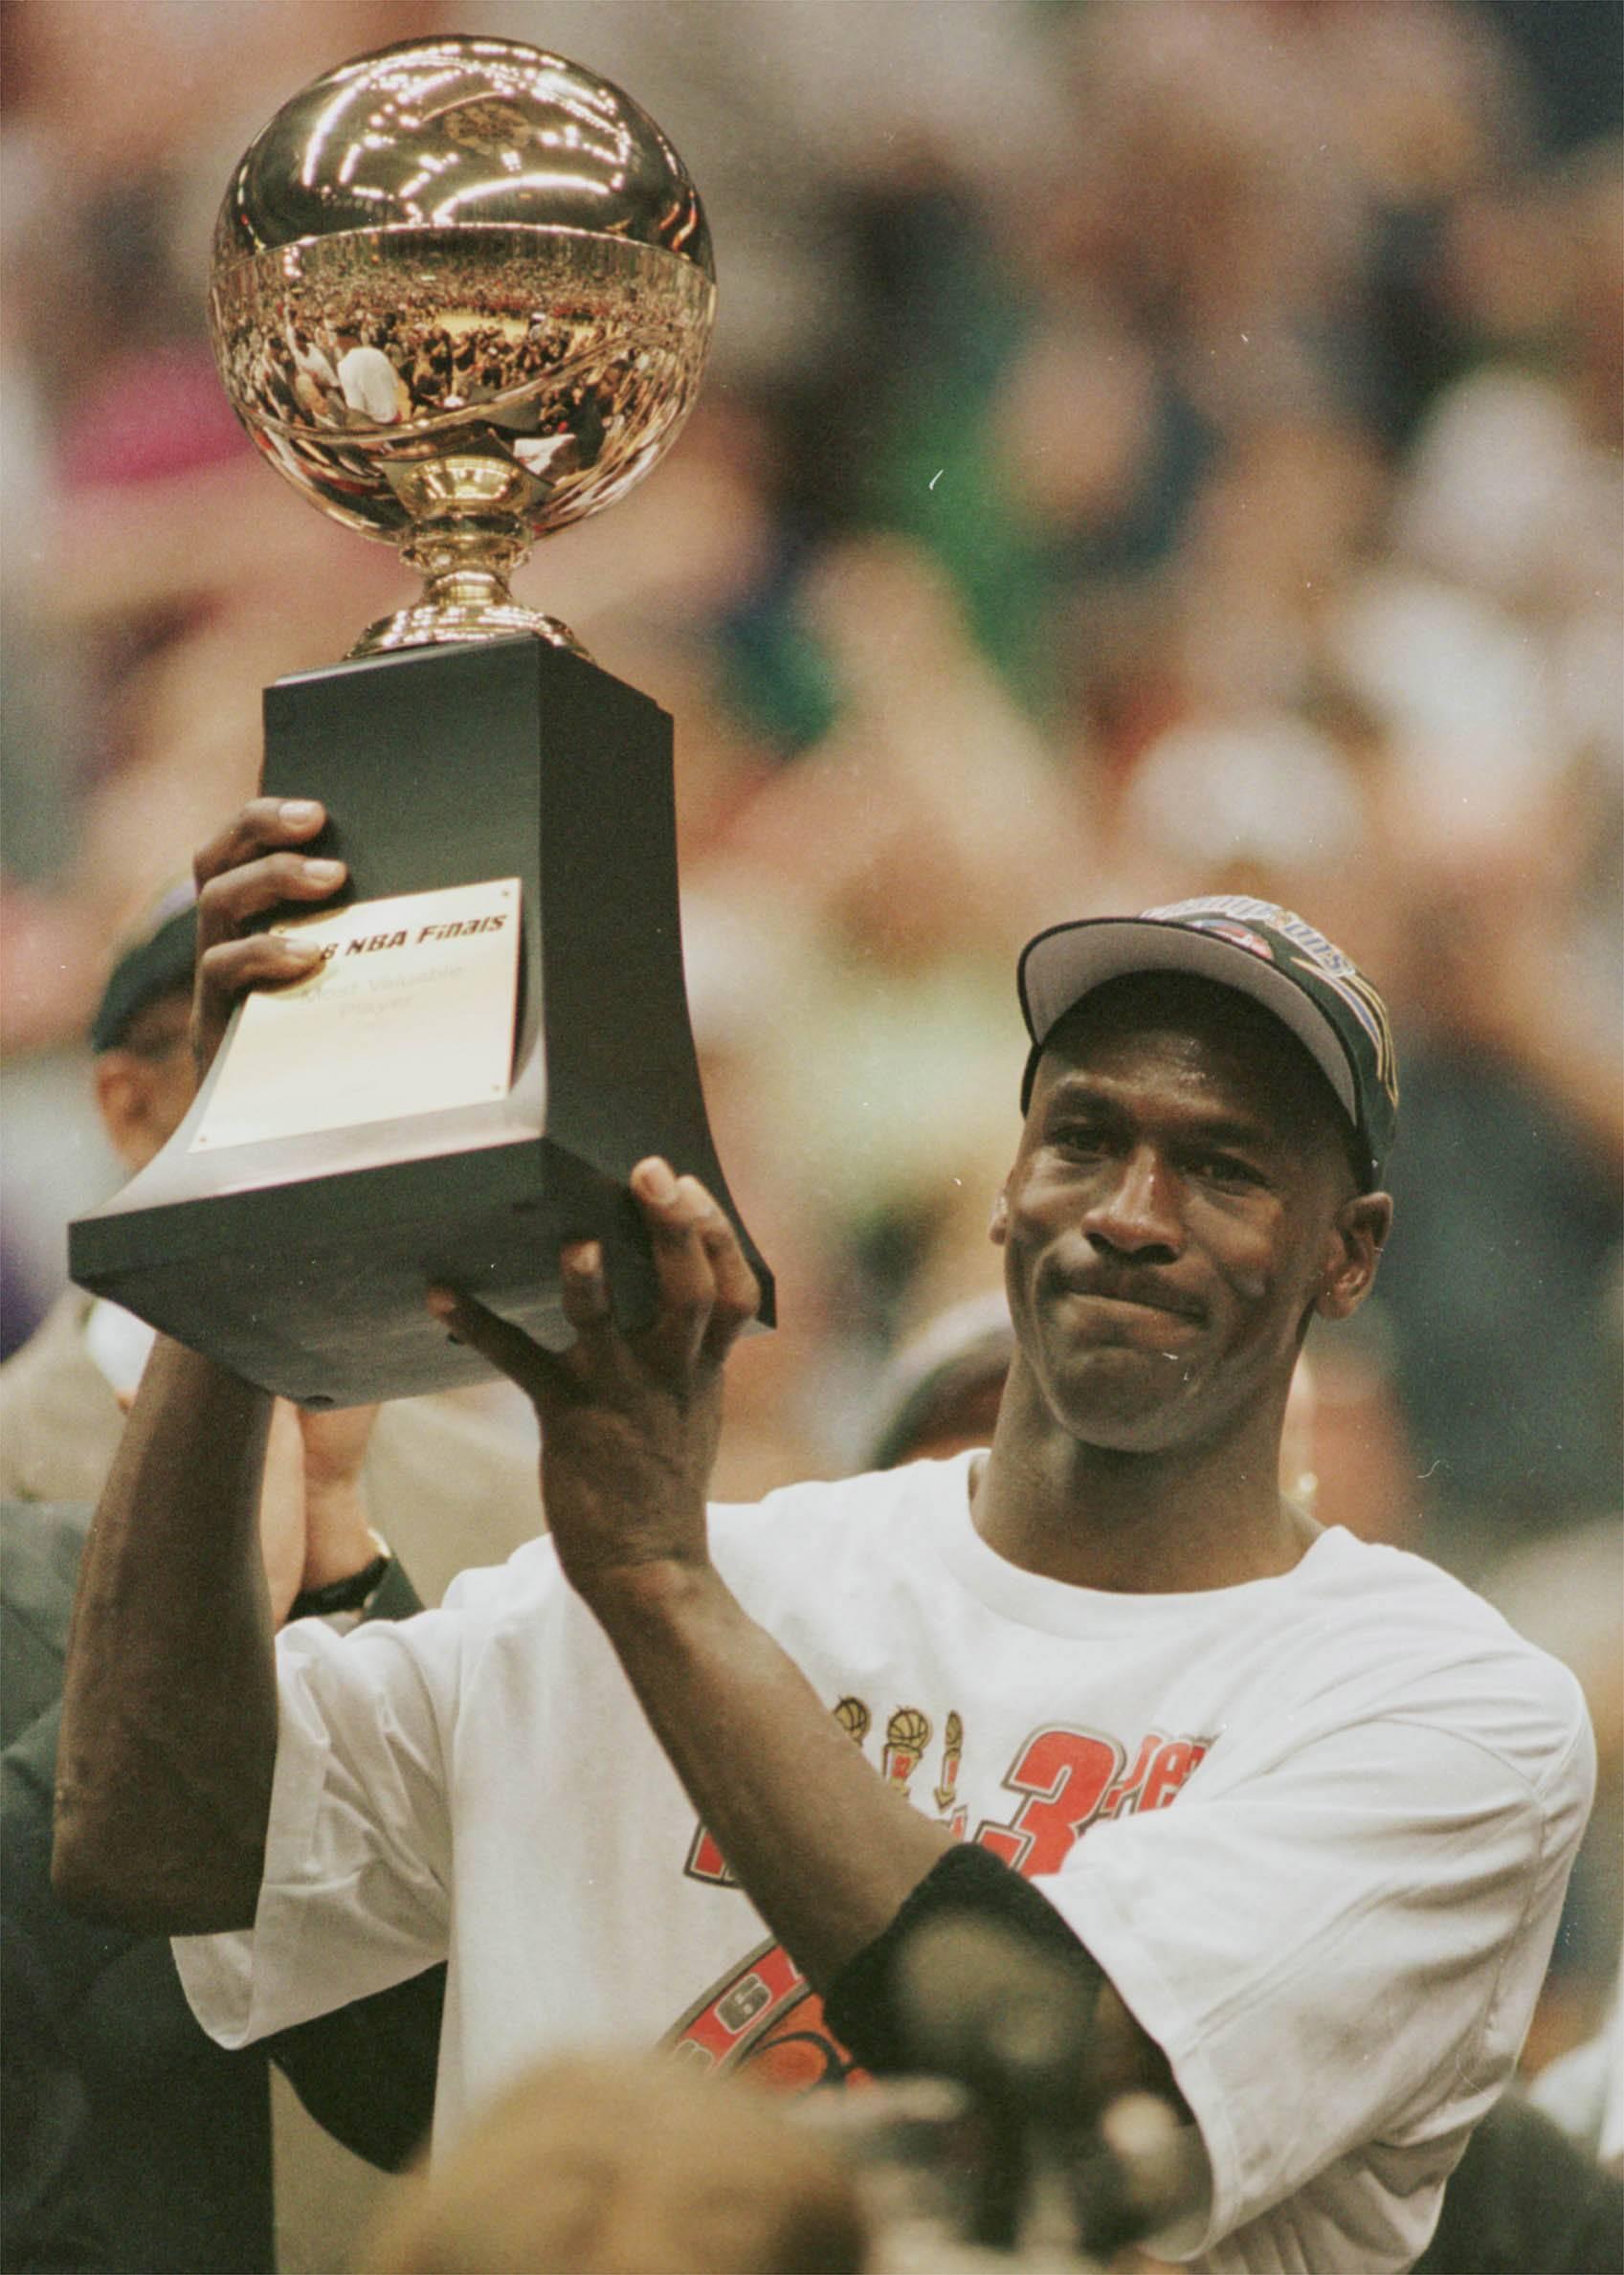 Images: A look back at the Bulls 1998 NBA championship - DailyHerald.com